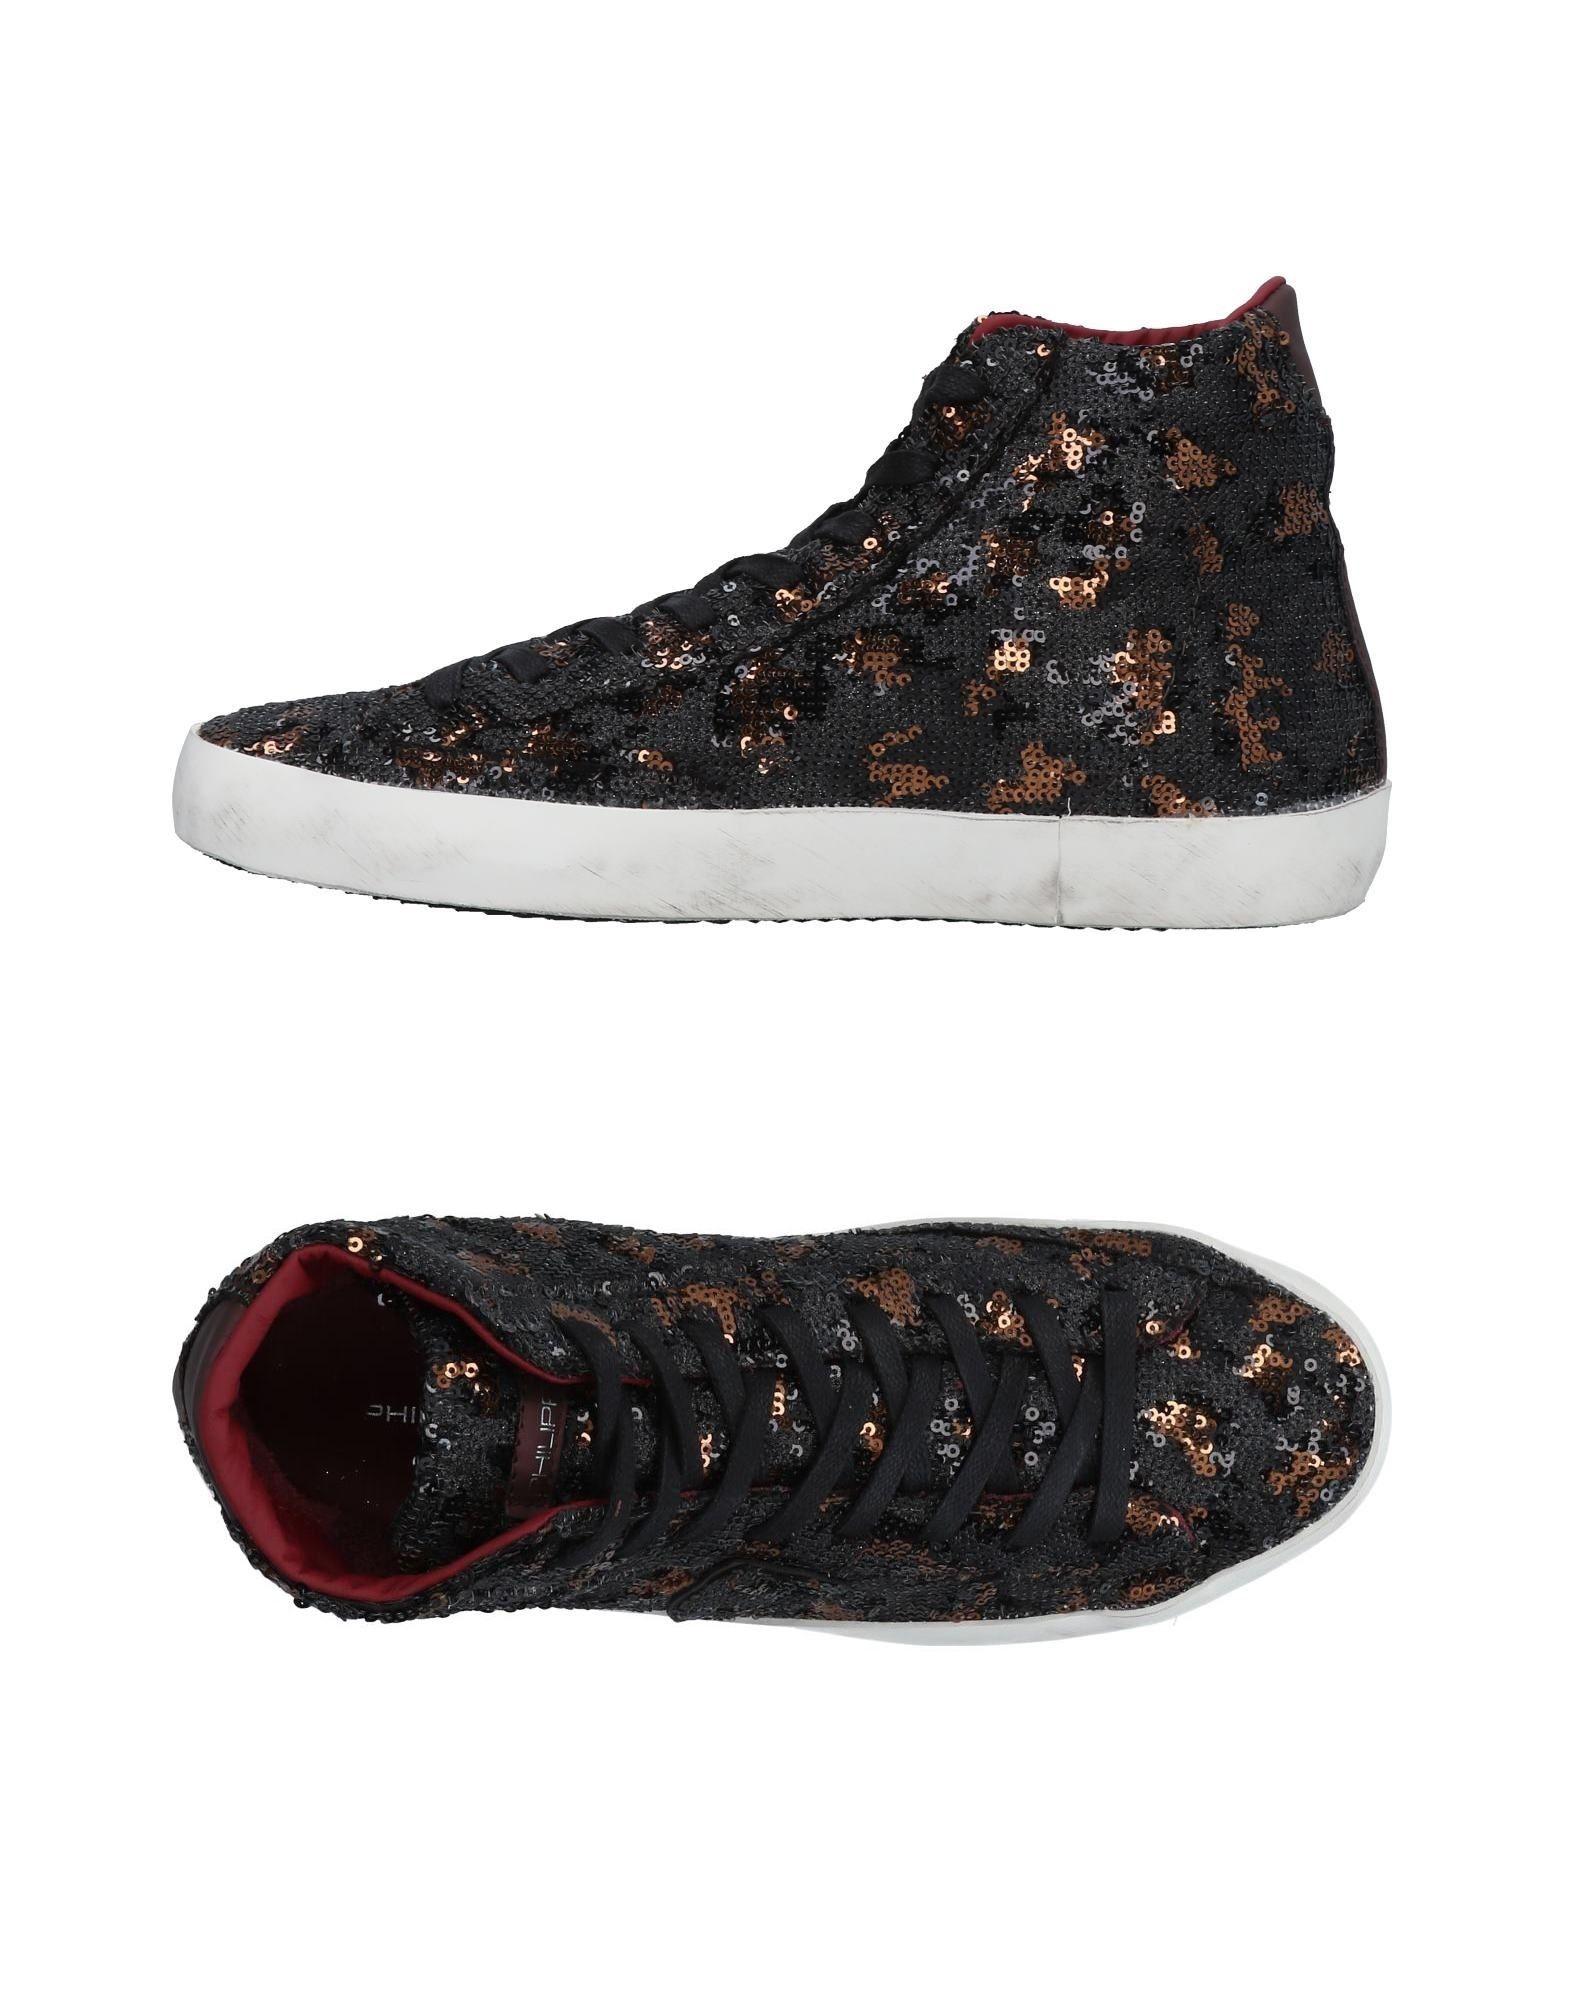 Stilvolle Sneakers billige Schuhe Philippe Model Sneakers Stilvolle Damen  11482441TH 9a3c6c